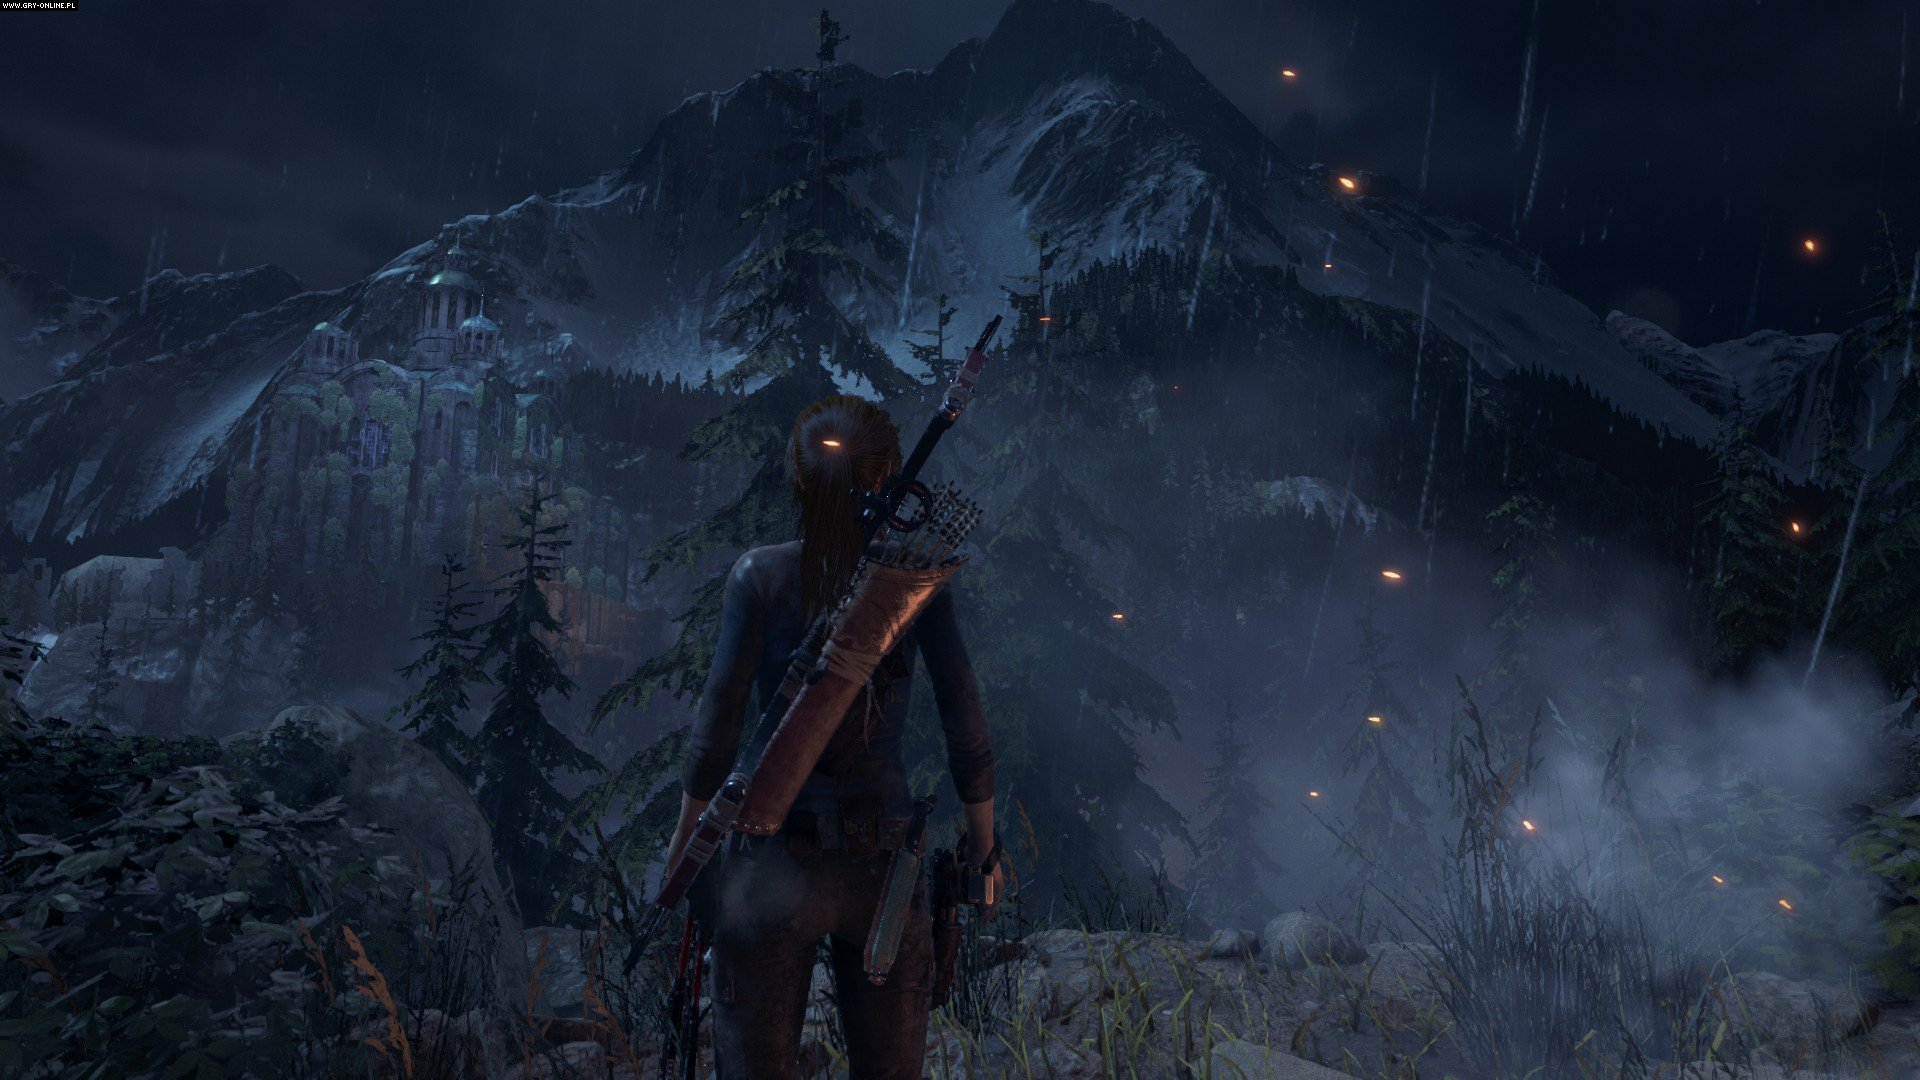 Rise of the Tomb Raider PC, XONE Games Image 39/126, Crystal Dynamics, Square-Enix / Eidos